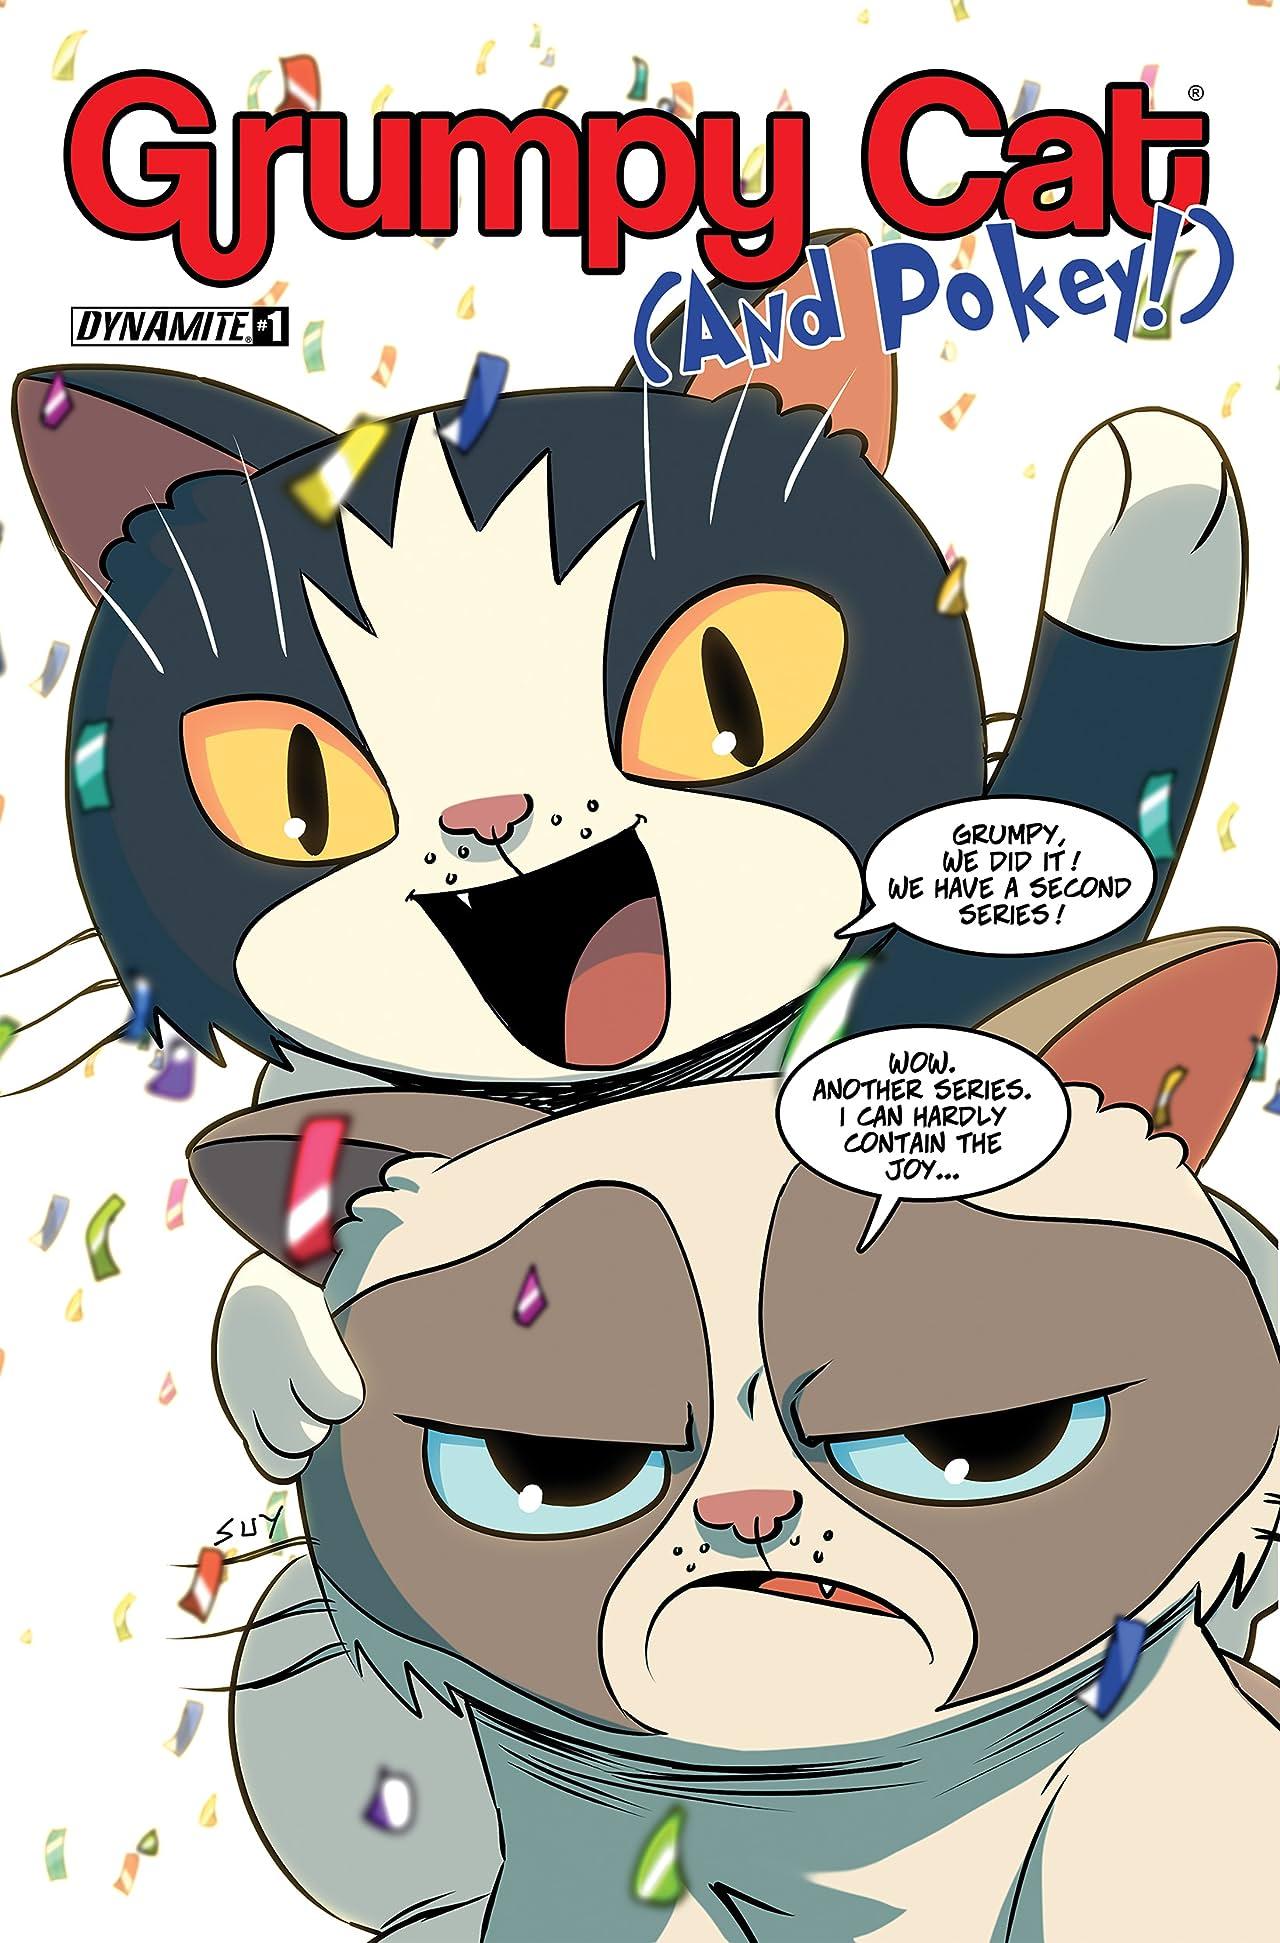 Grumpy Cat And Pokey Vol. 2 #1: Digital Exclusive Edition